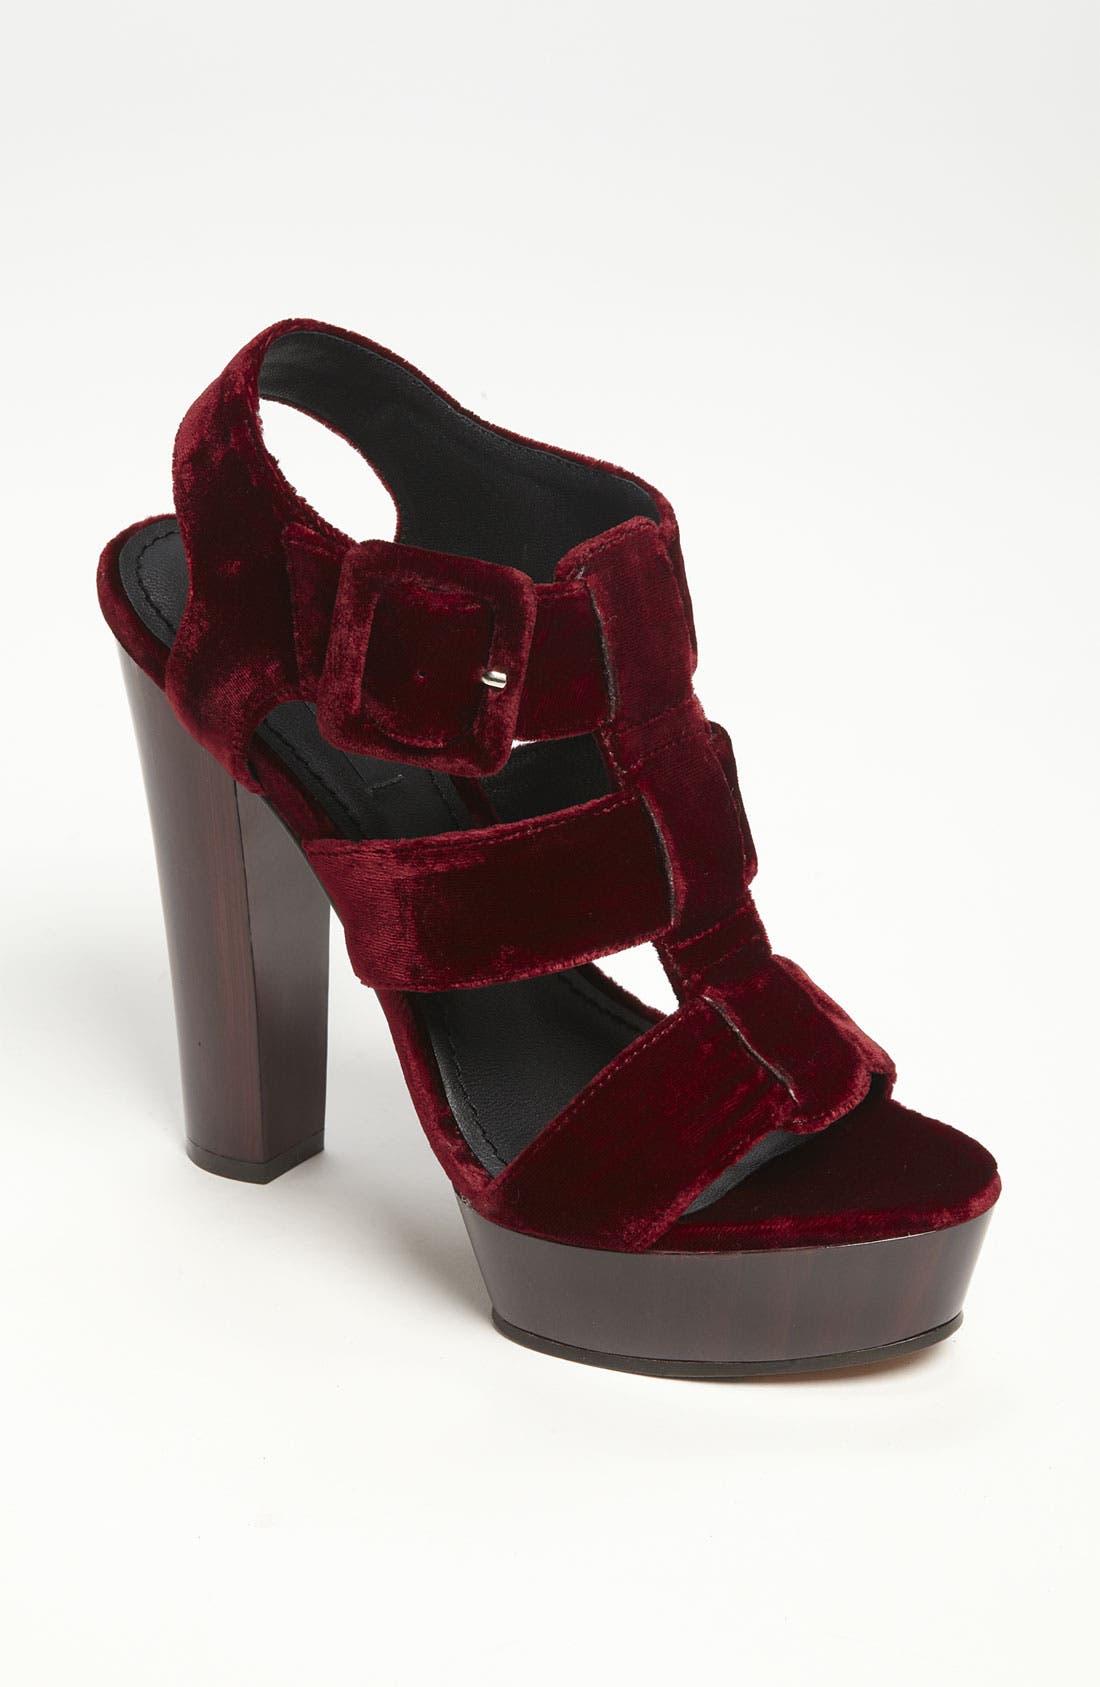 Alternate Image 1 Selected - Rachel Zoe 'Lila' Sandal (Exclusive Color)